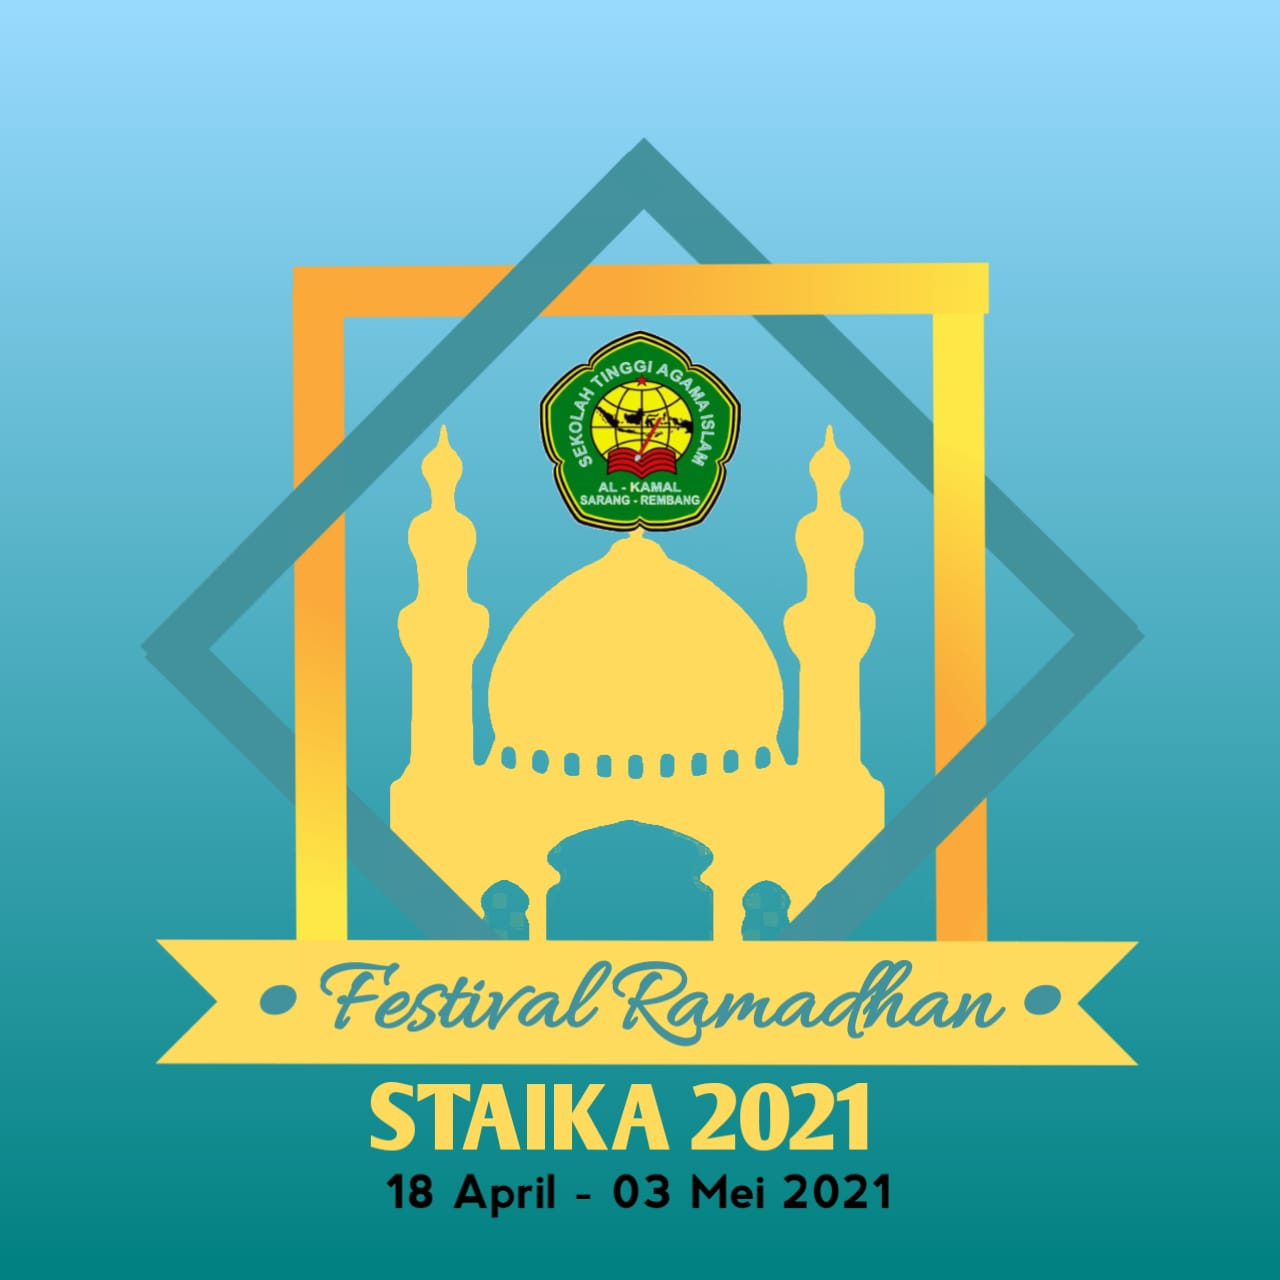 FESTIVAL RAMADHAN 2021